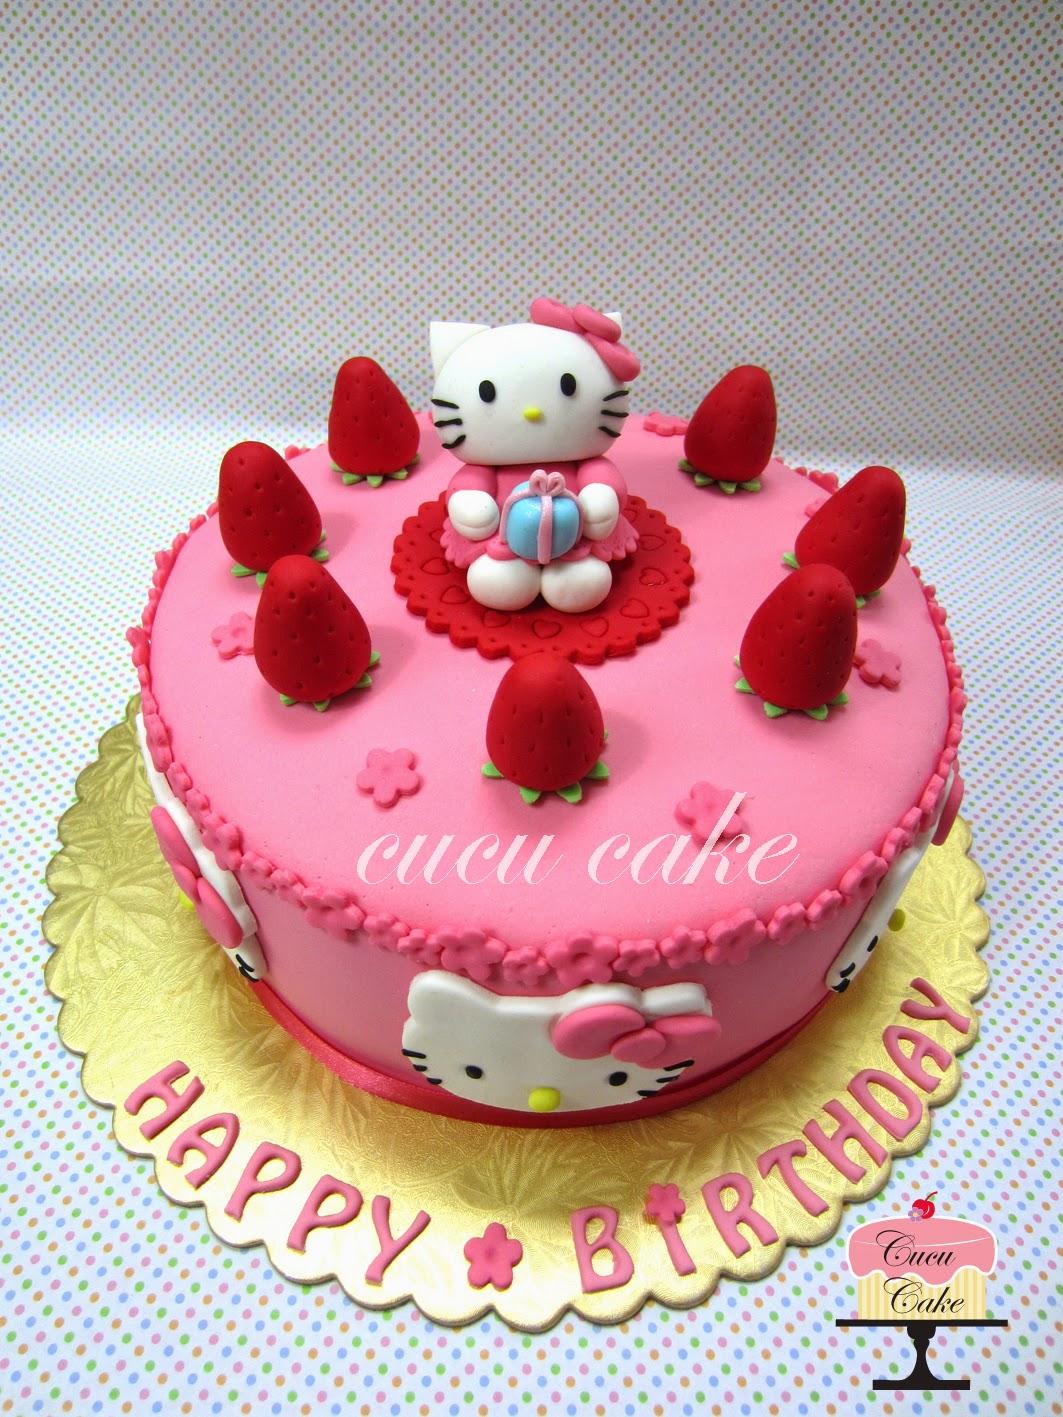 Cake Hello Kitty Pink : Hello Kitty Pink Cake Cucu Cake